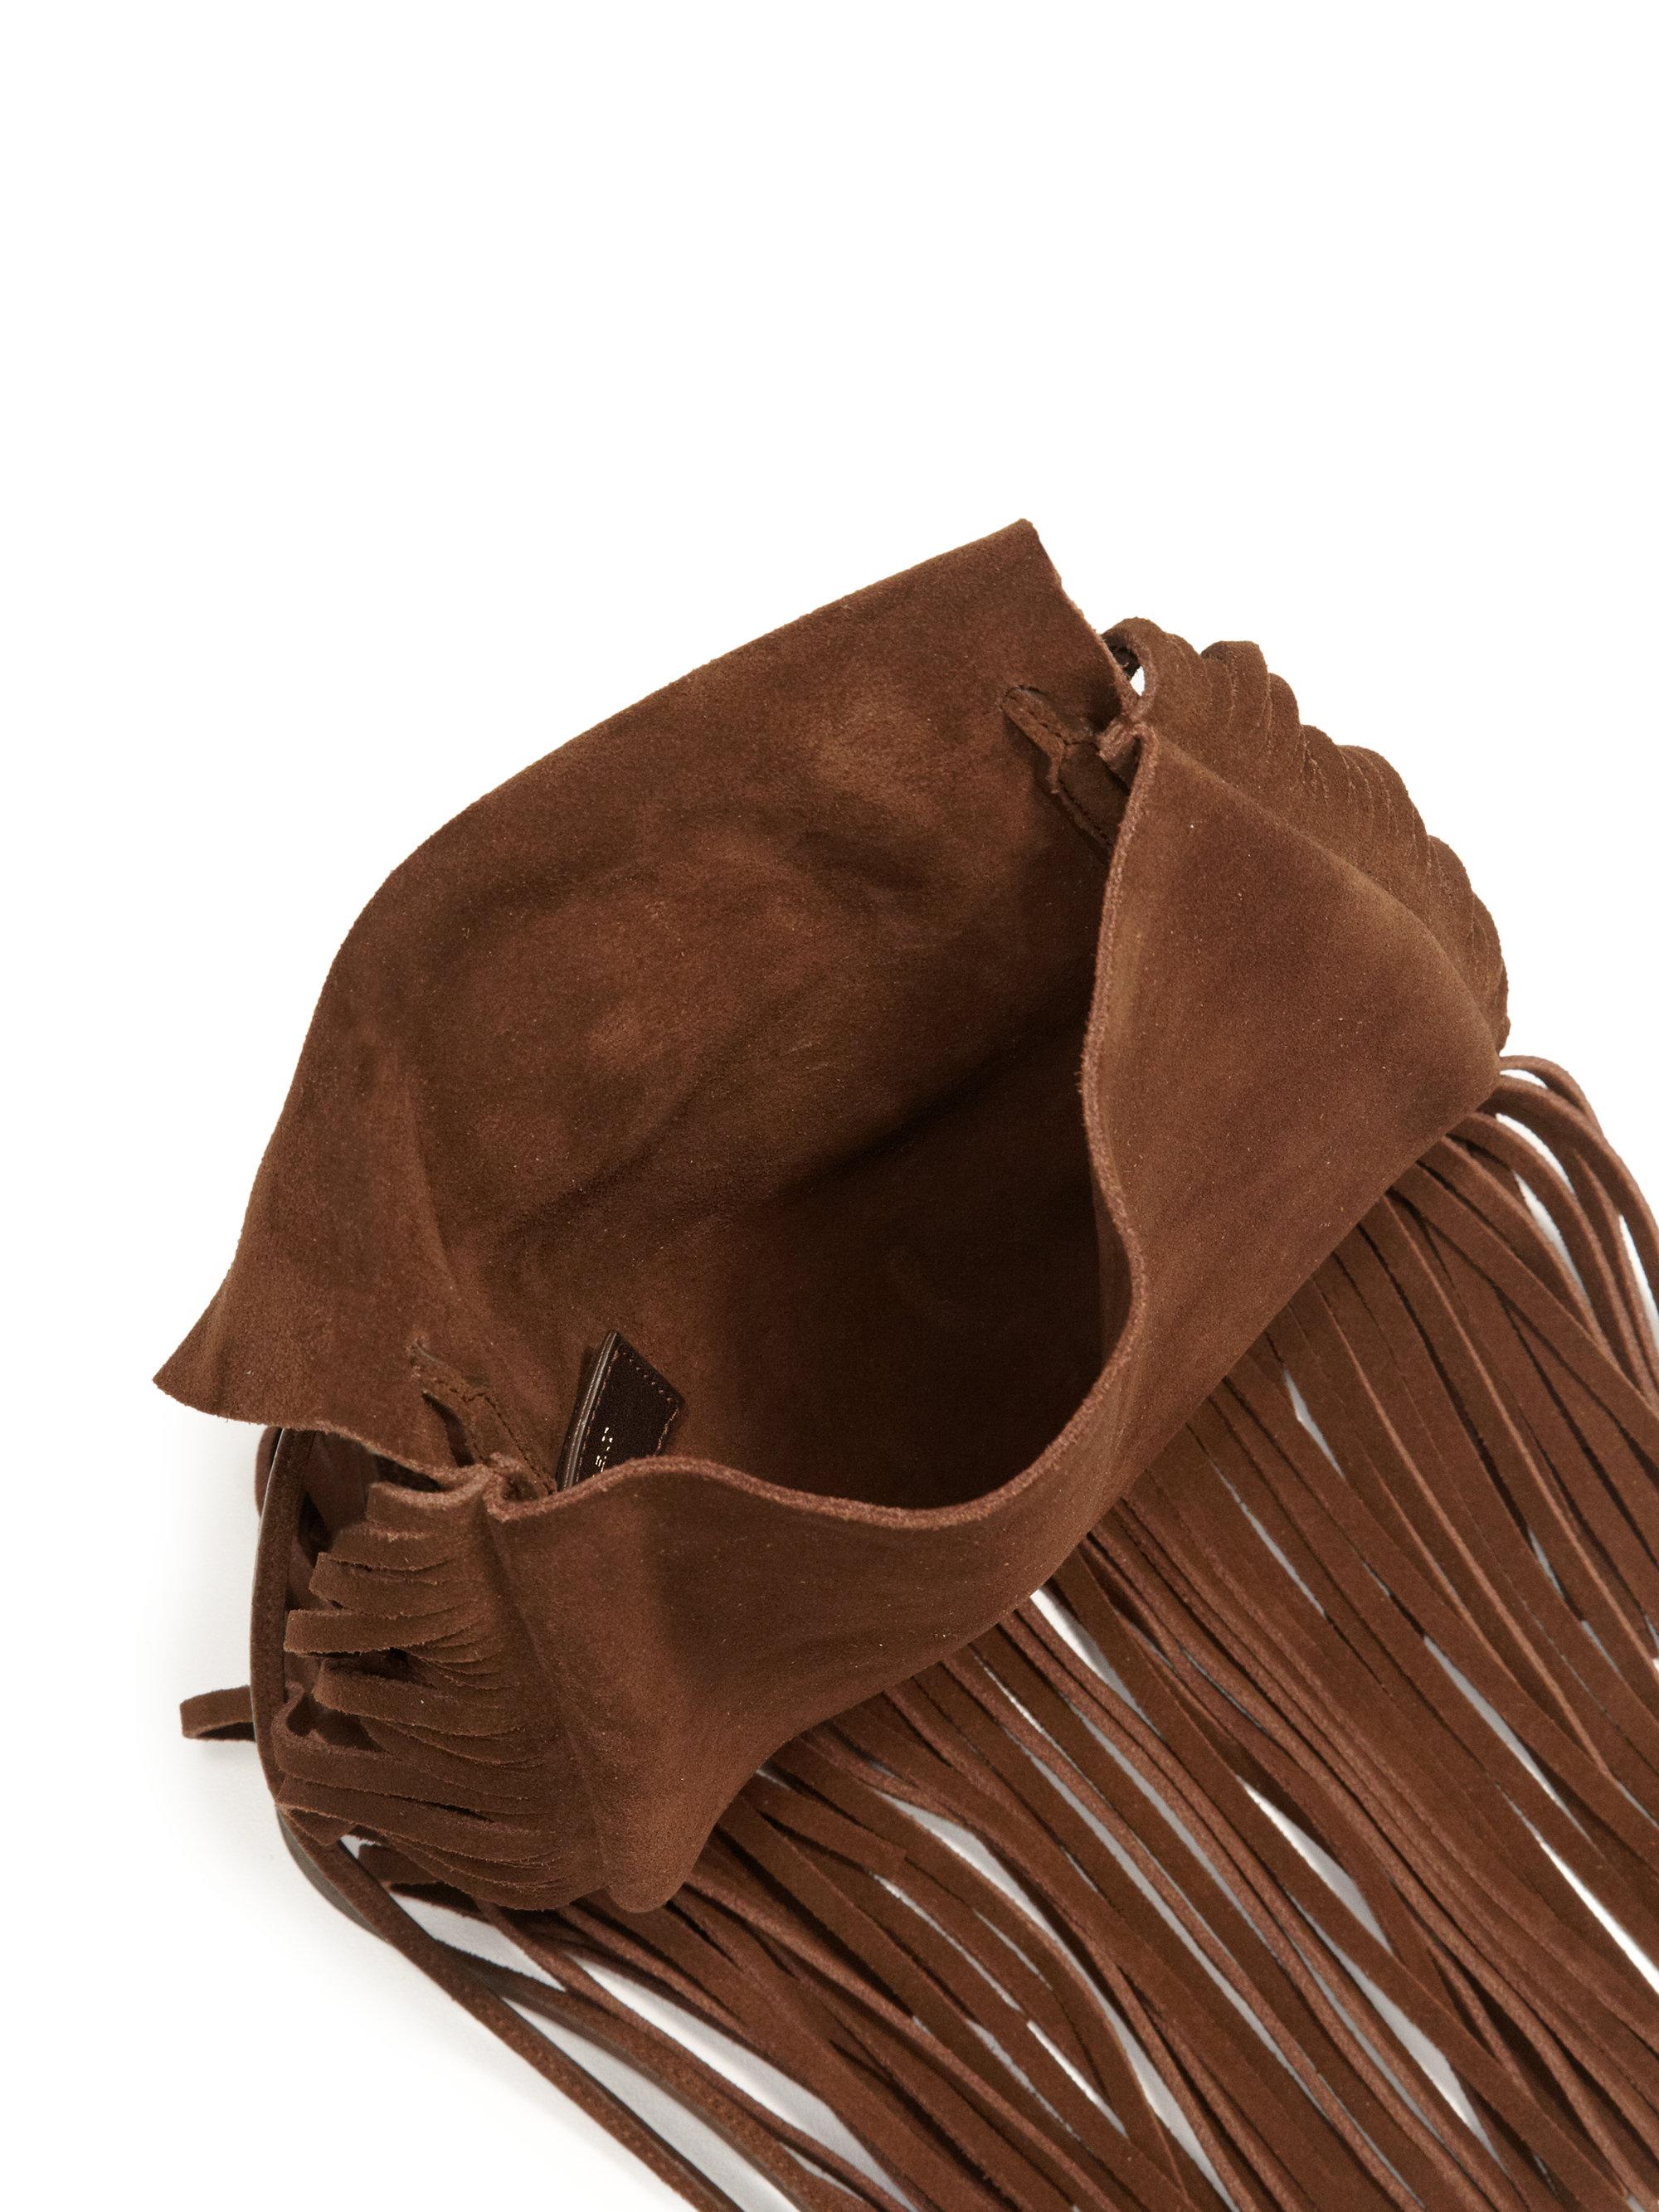 01d94bff3556 Lyst - Saint Laurent Anita Fringe Suede Crossbody Bag in Brown